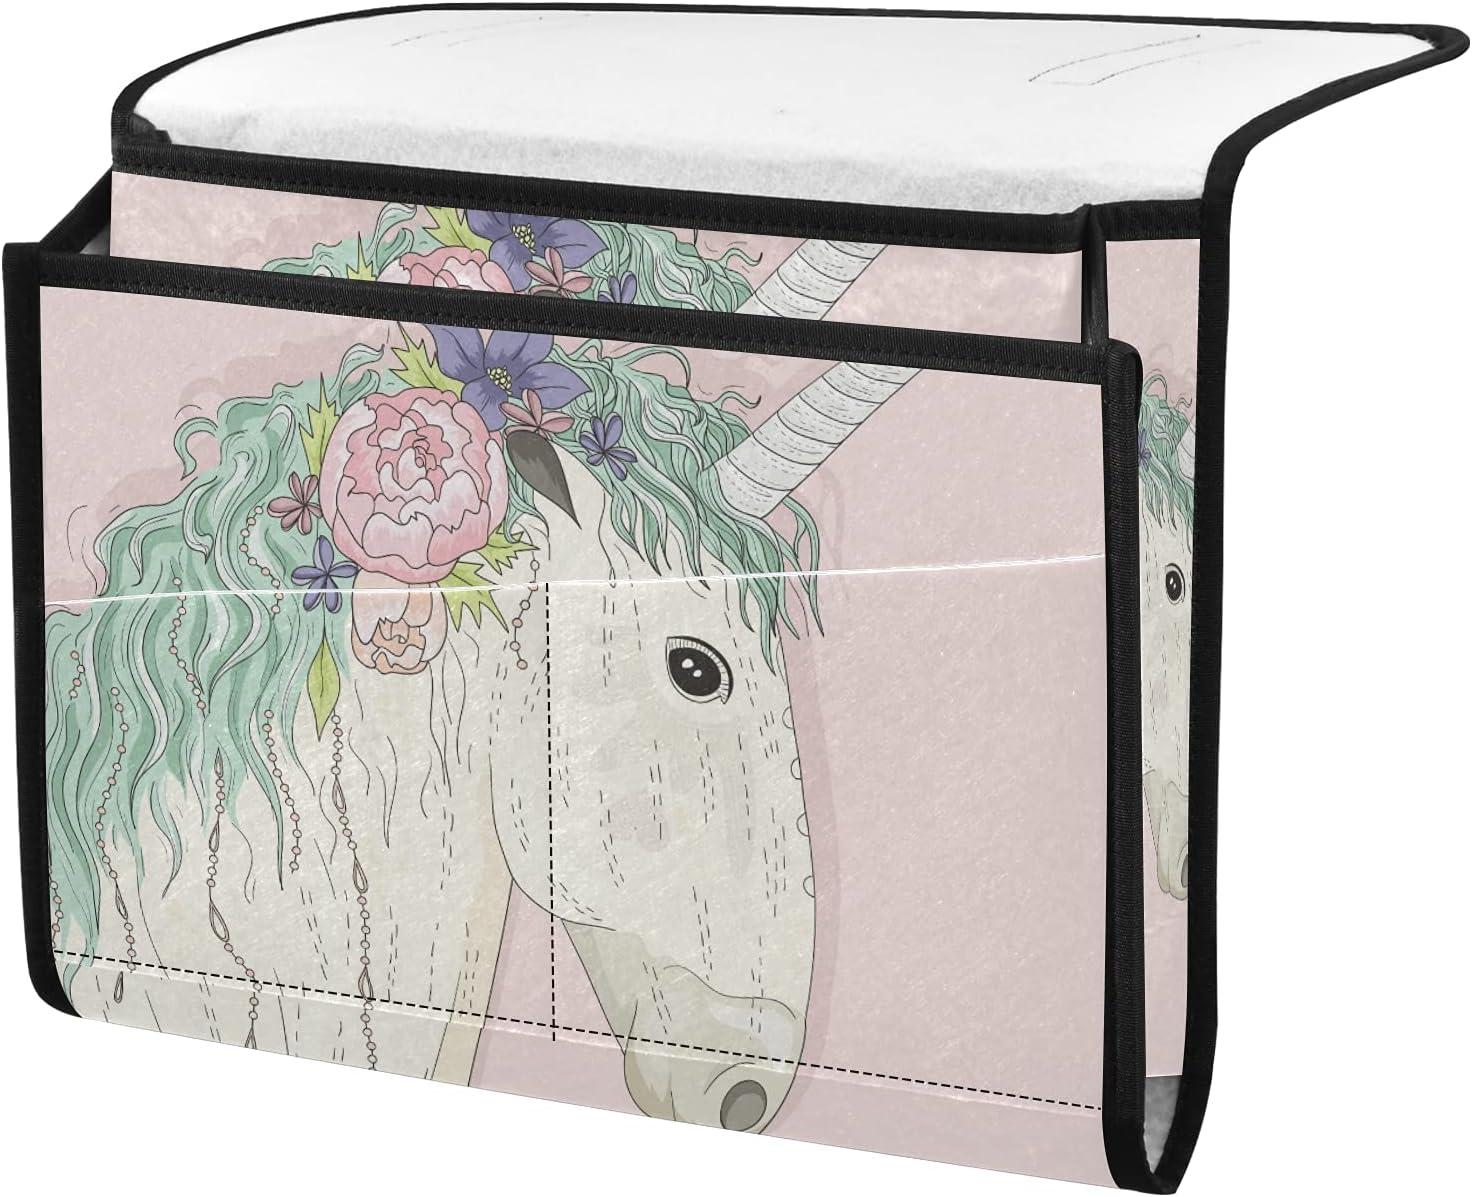 senya Cute Unicorn with In a popularity Flowers Bedside Organizer Bedsid Storage Kansas City Mall